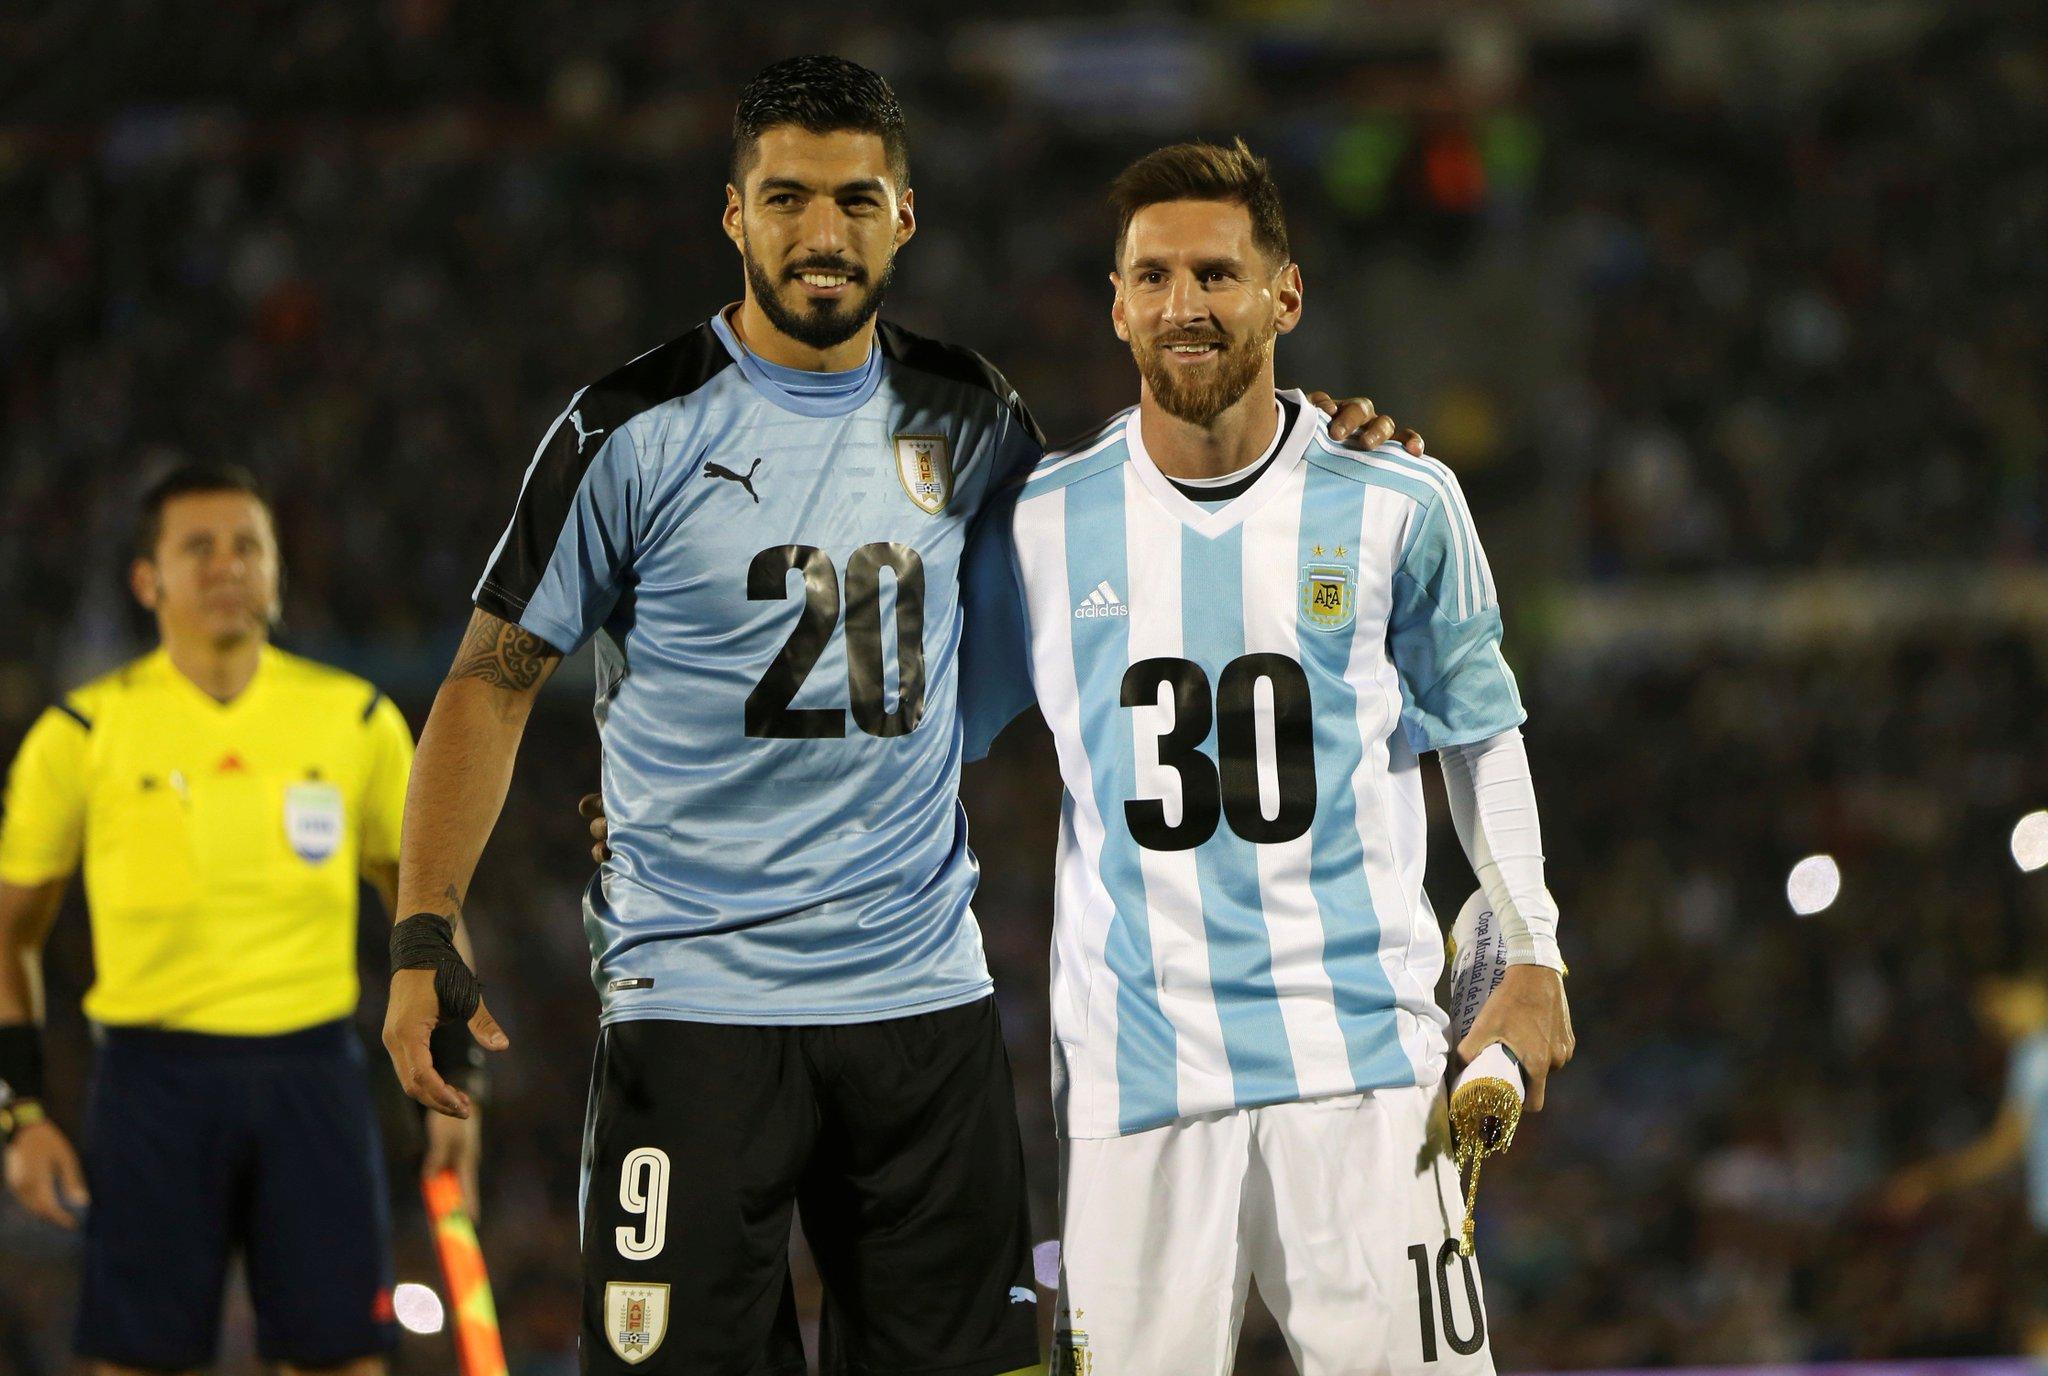 бельё уругвай аргентина 31 августа 2017 современных